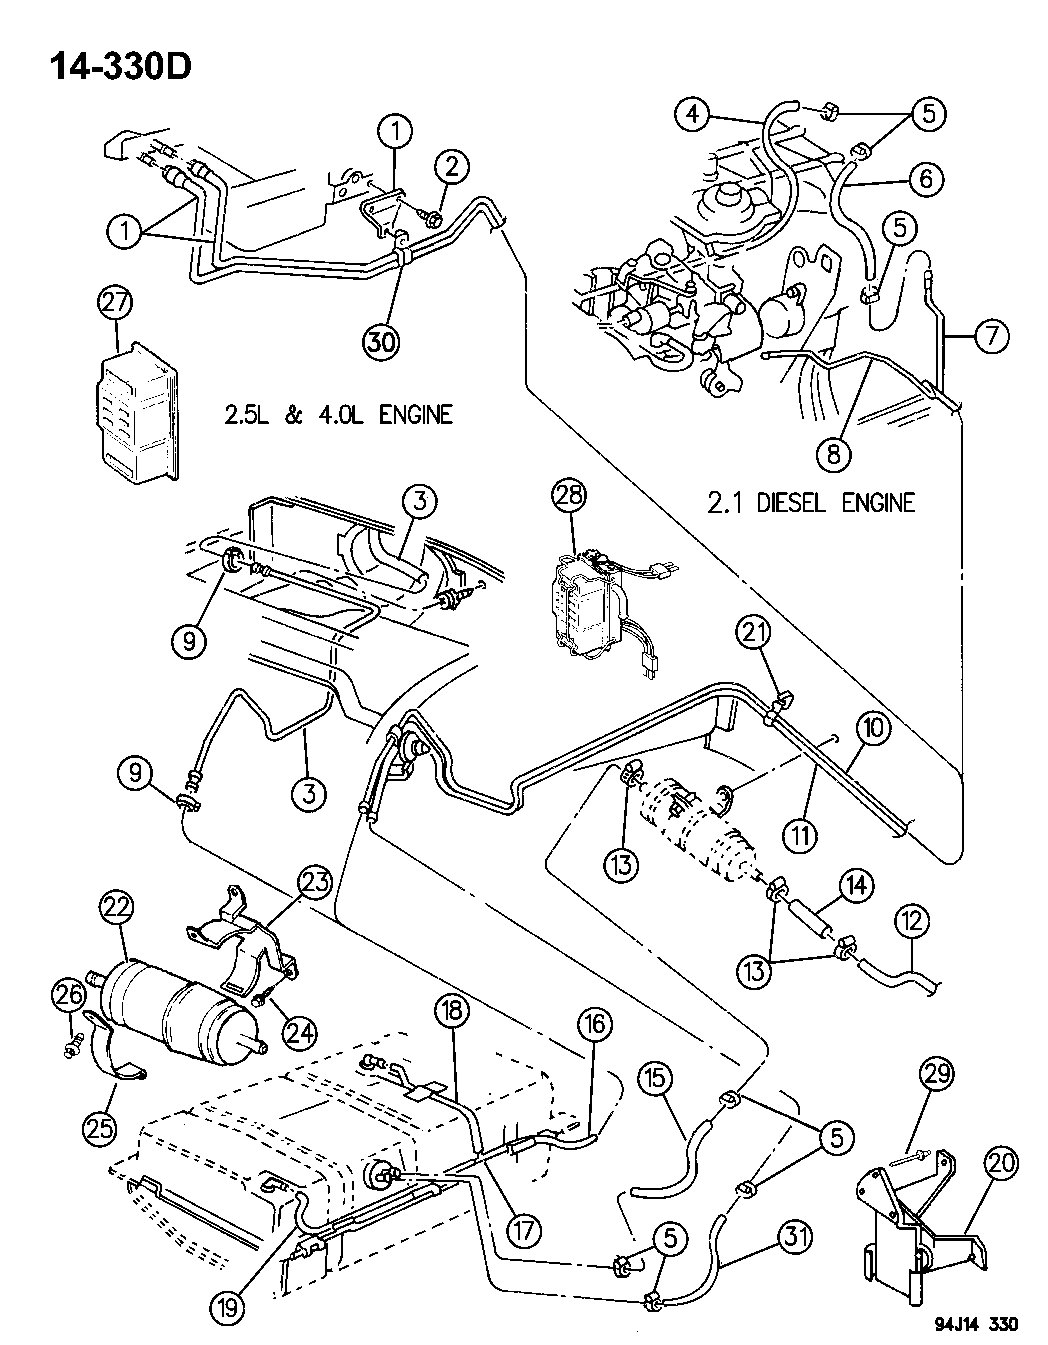 1994 jeep cherokee fuel filter location